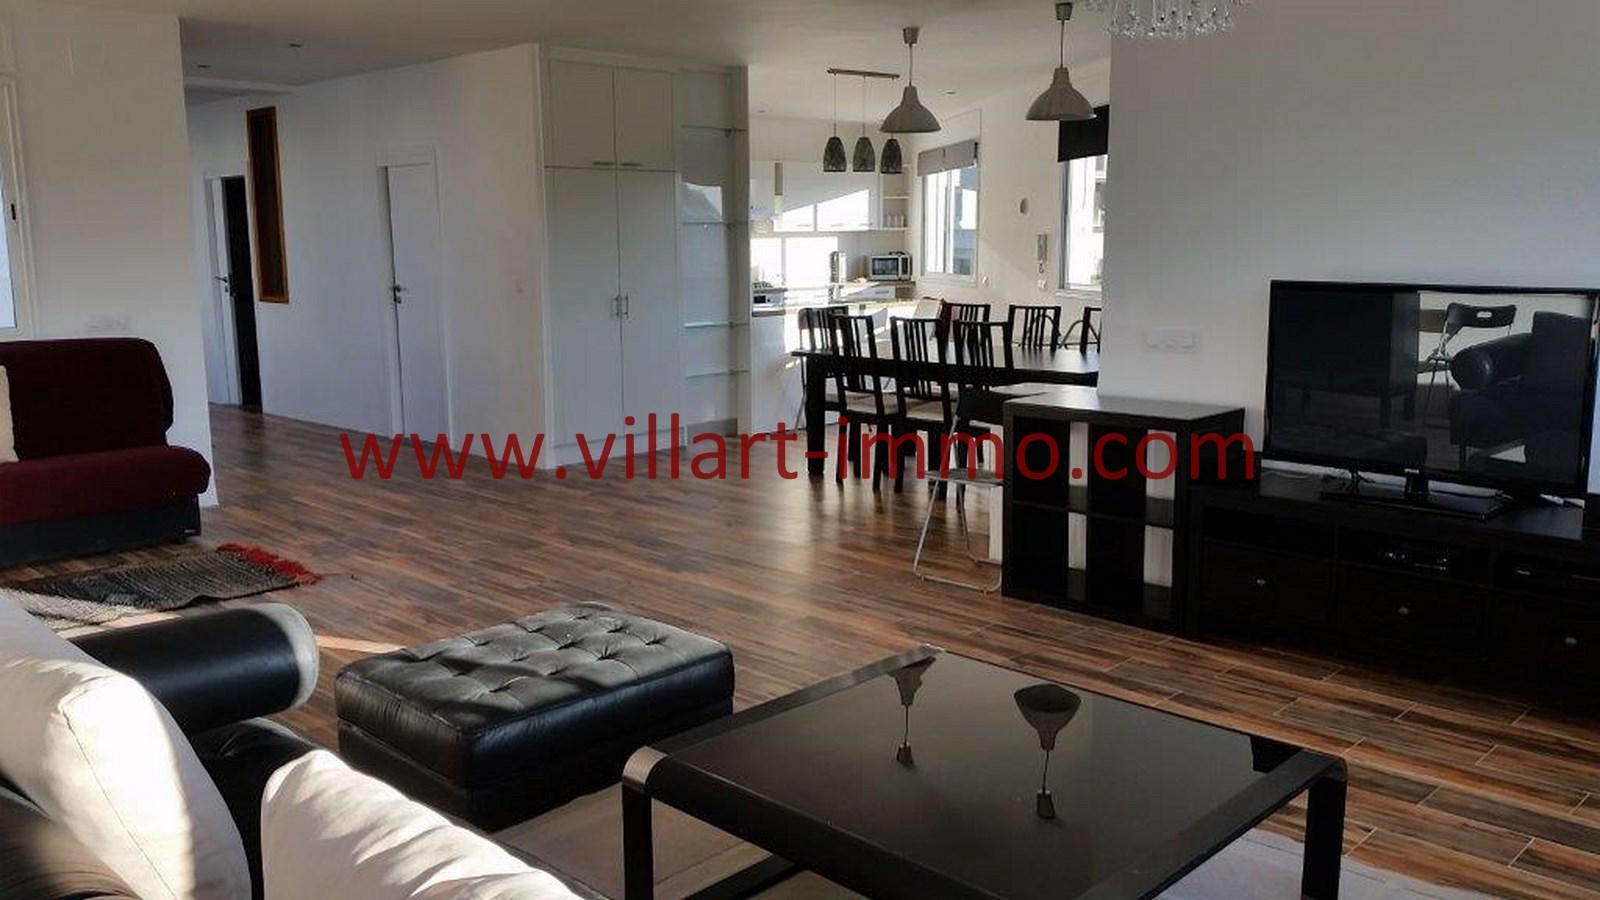 4-Vente-Appartement-Tanger-Centre-De-Ville-Salon 2-VA518-Villart Immo